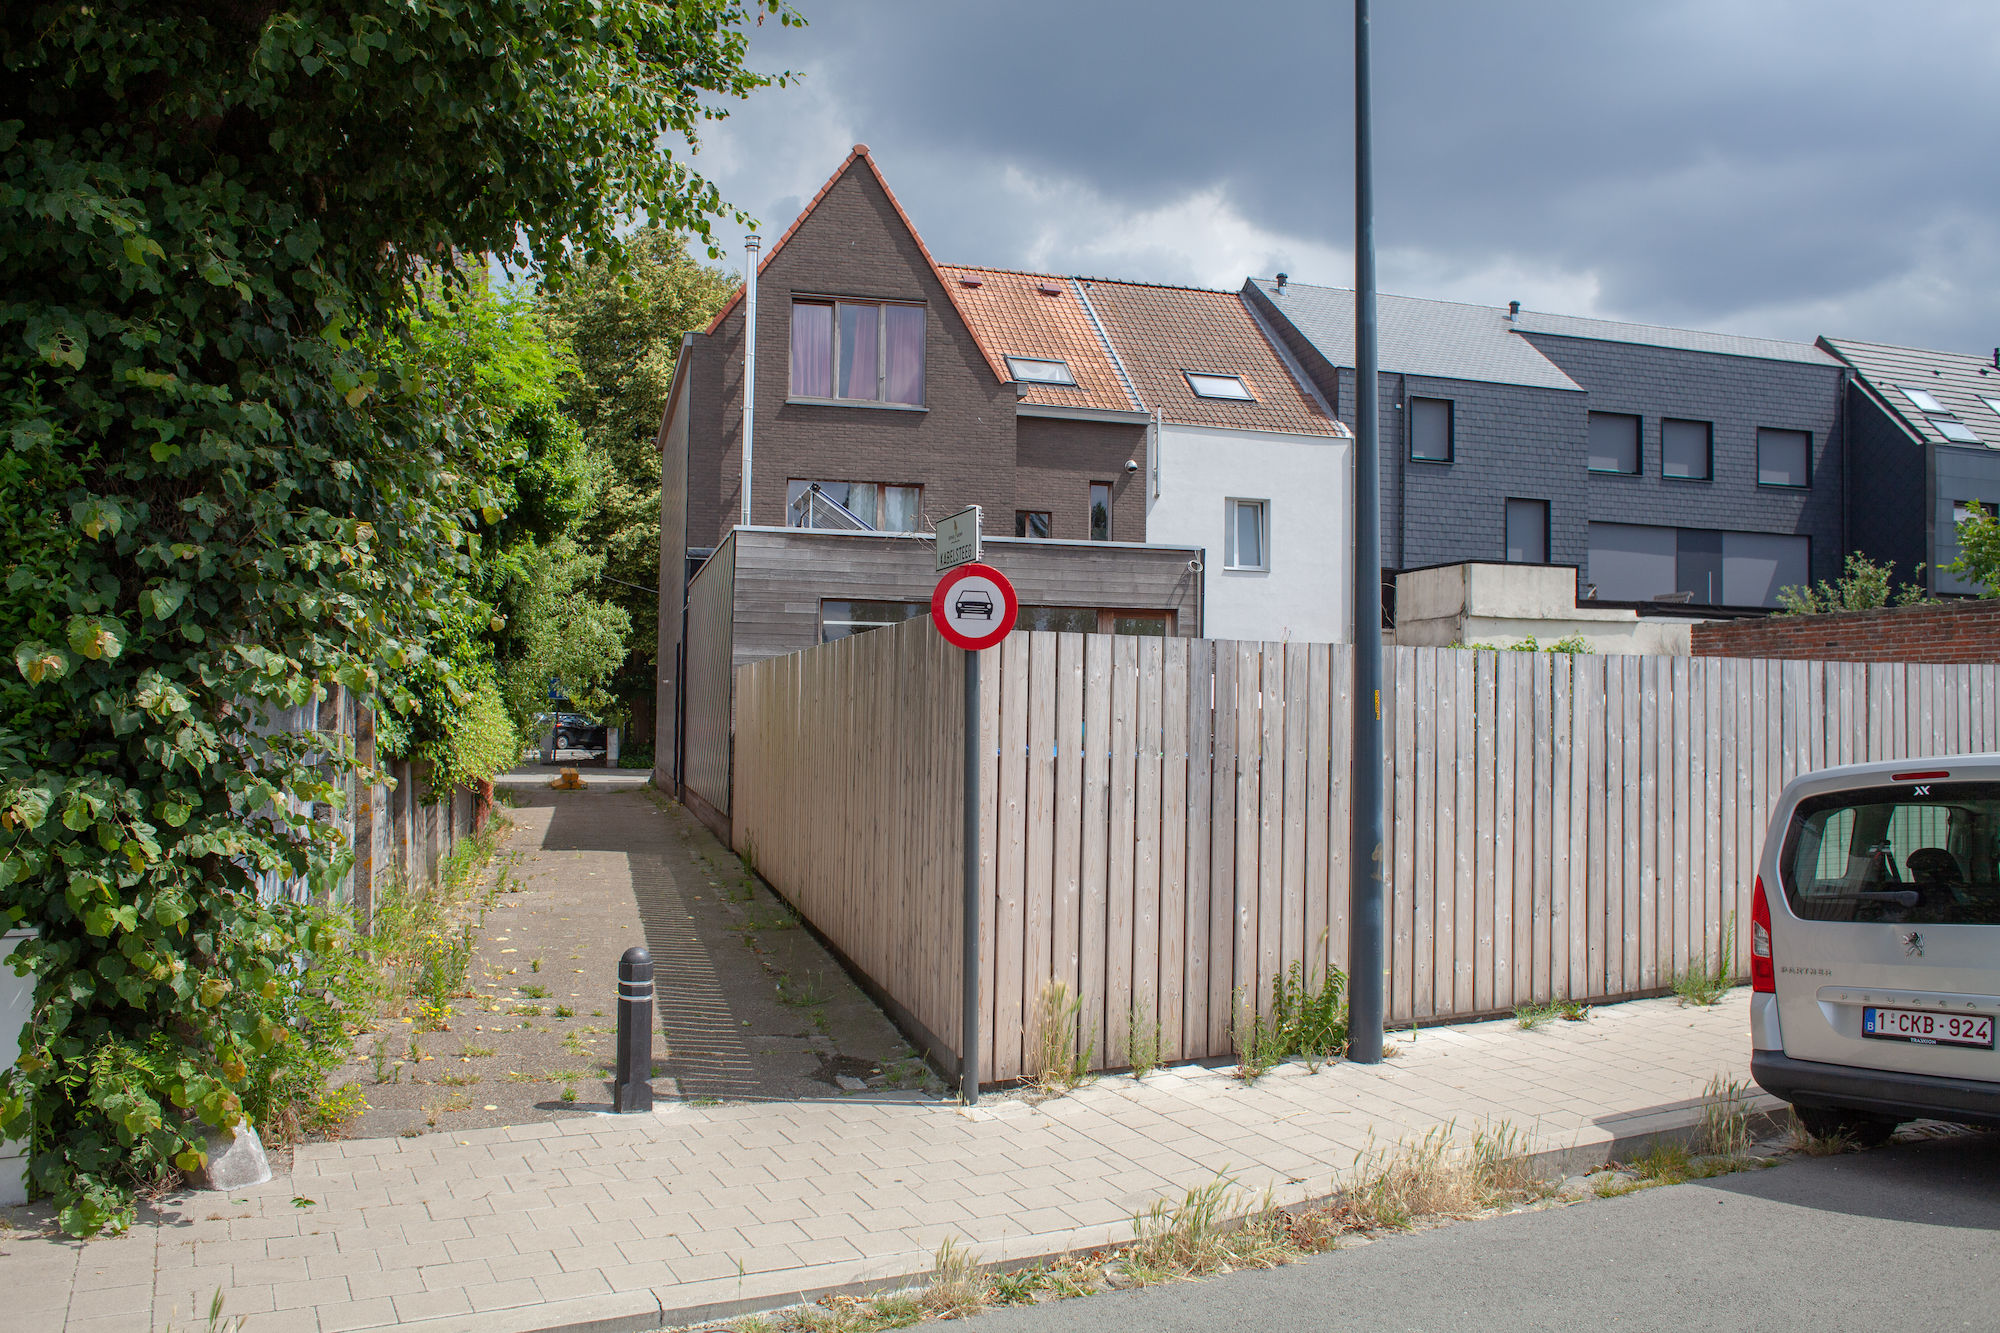 2019-07-02 Muide Meulestede prospectie Wannes_stadsvernieuwing_IMG_0380-3.jpg